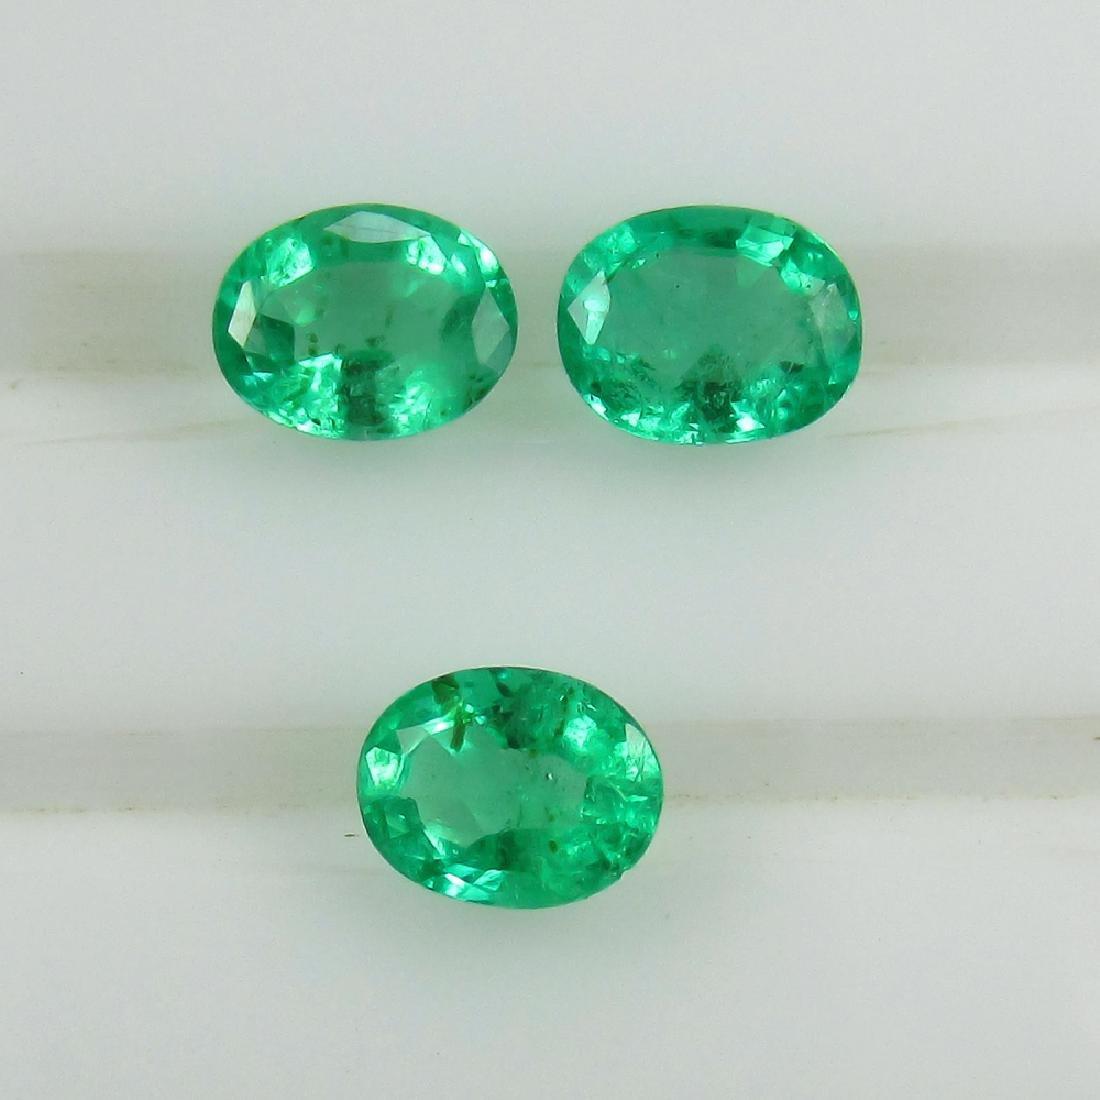 0.72 Ctw Natural 3 Loose Zambian Emerald 4.5X3.5 mm